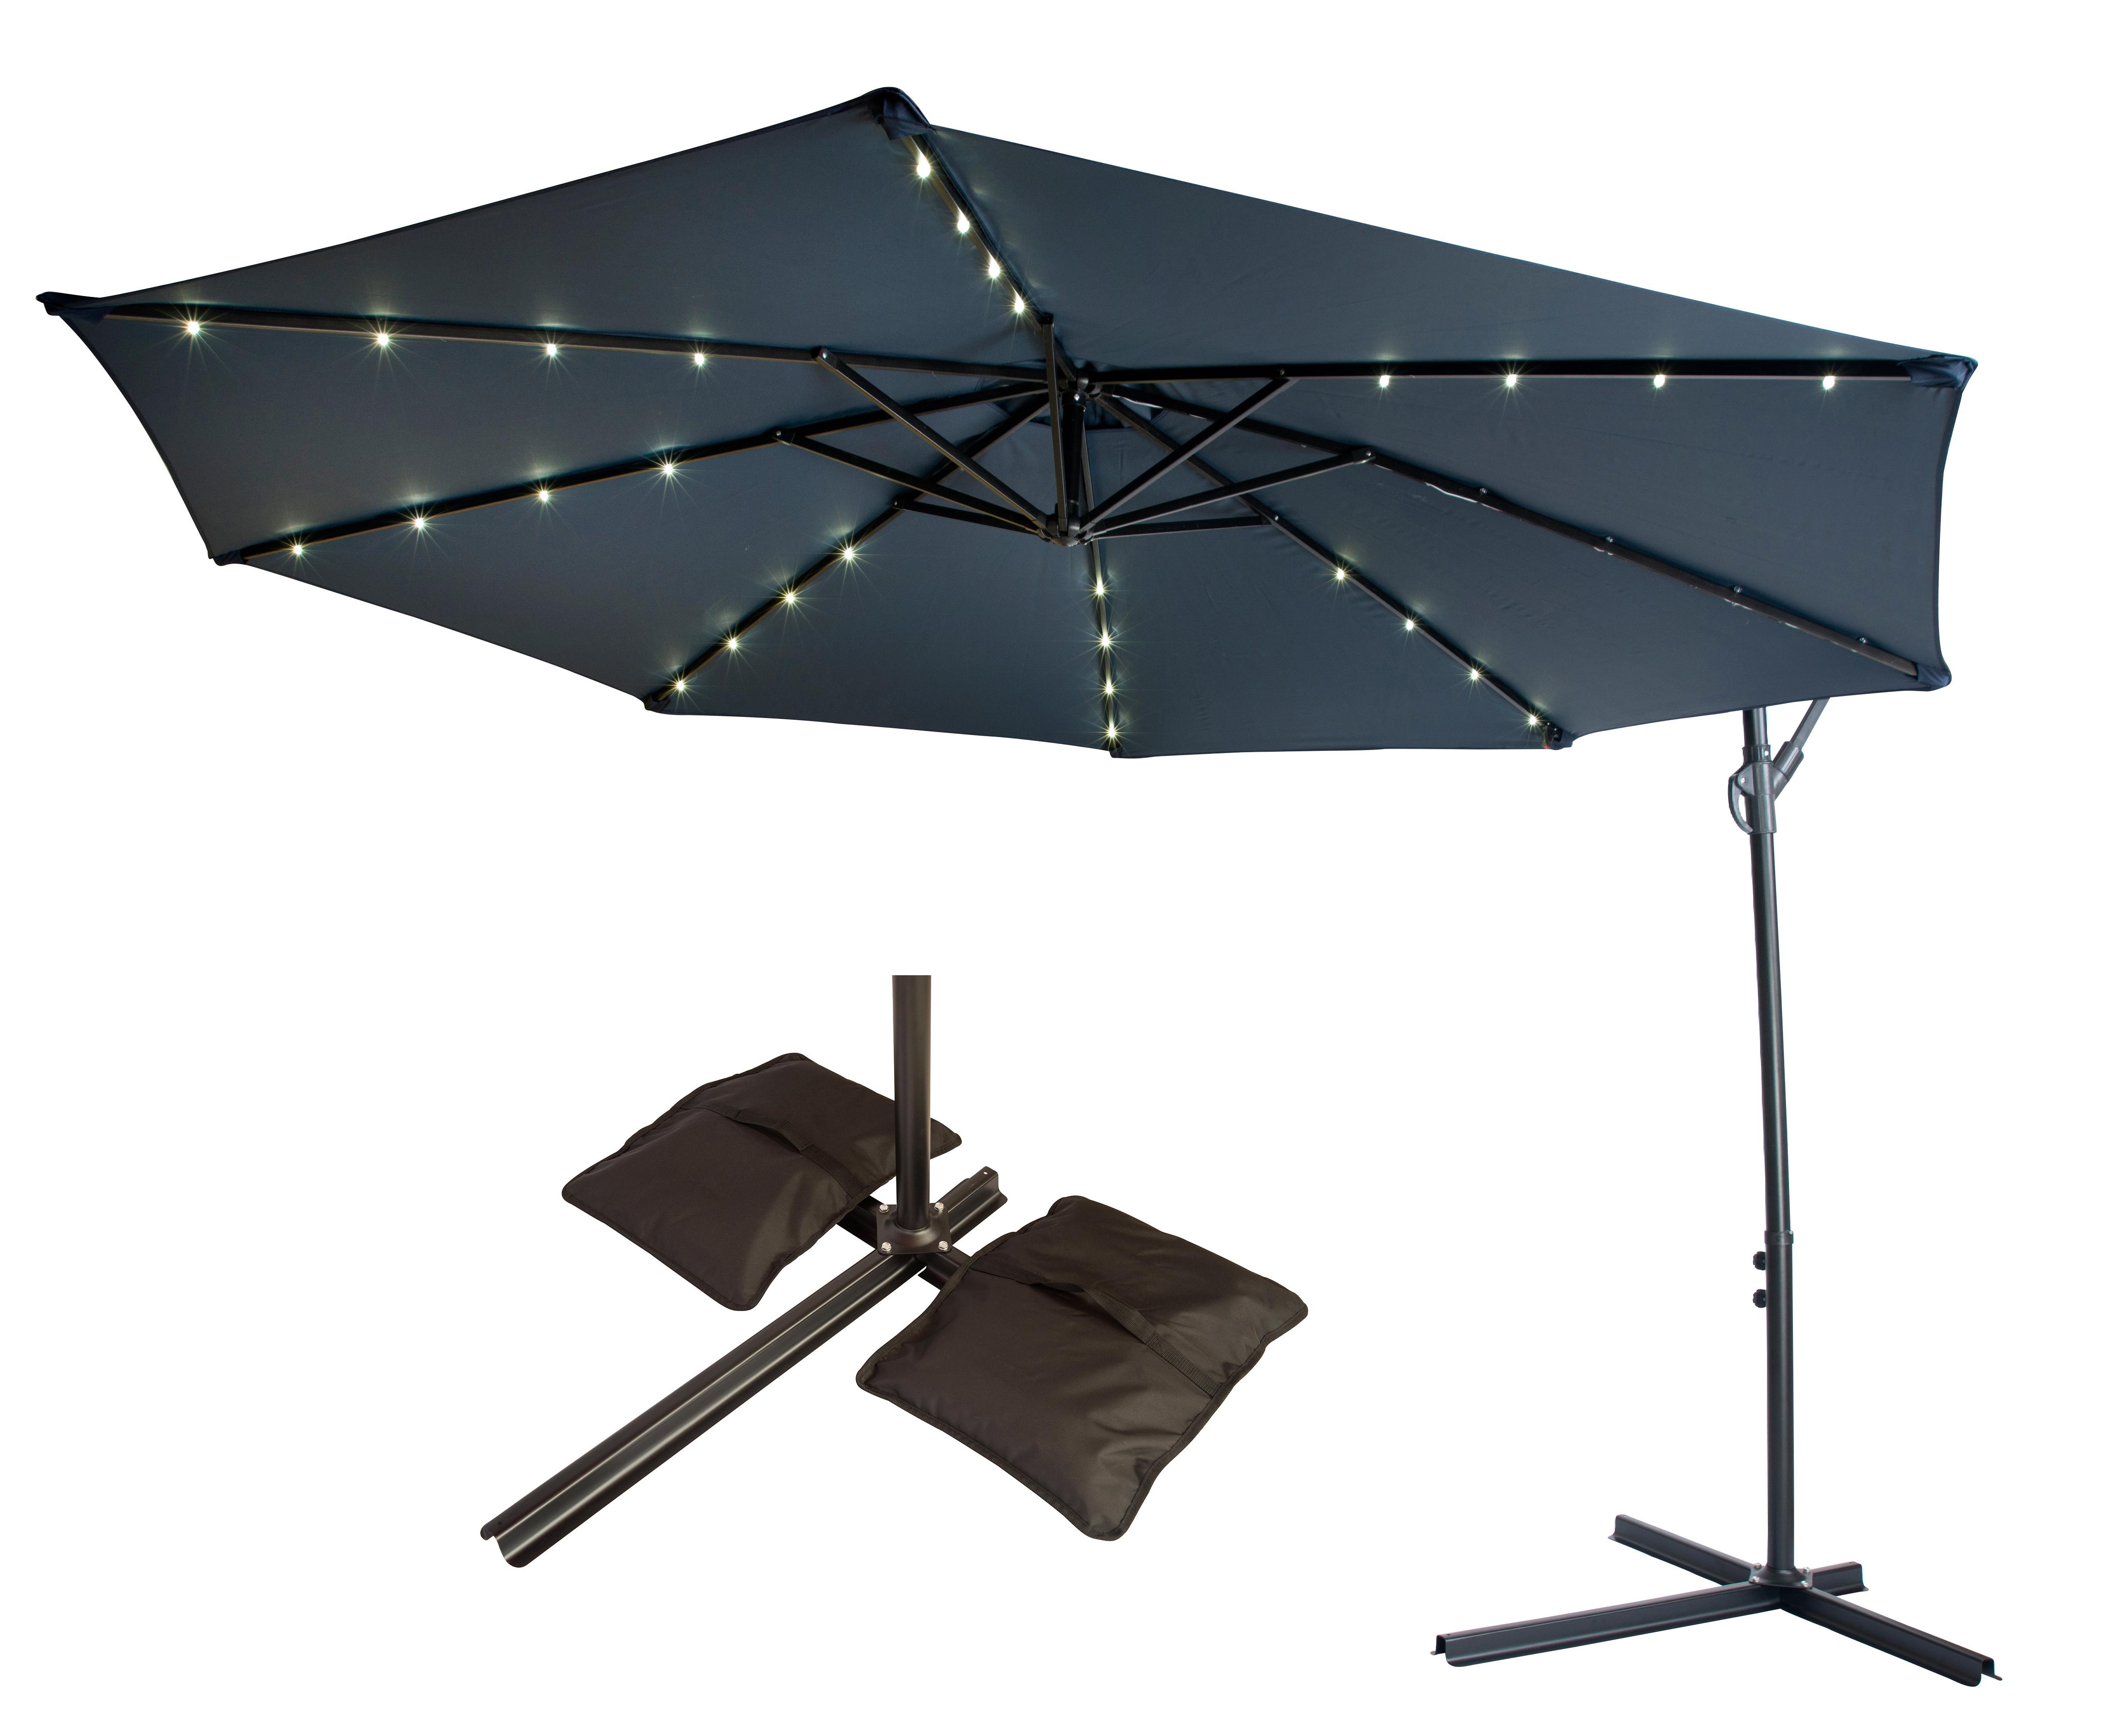 Ryant Cantilever Umbrellas Throughout 2020 10' Cantilever Umbrella (View 16 of 20)